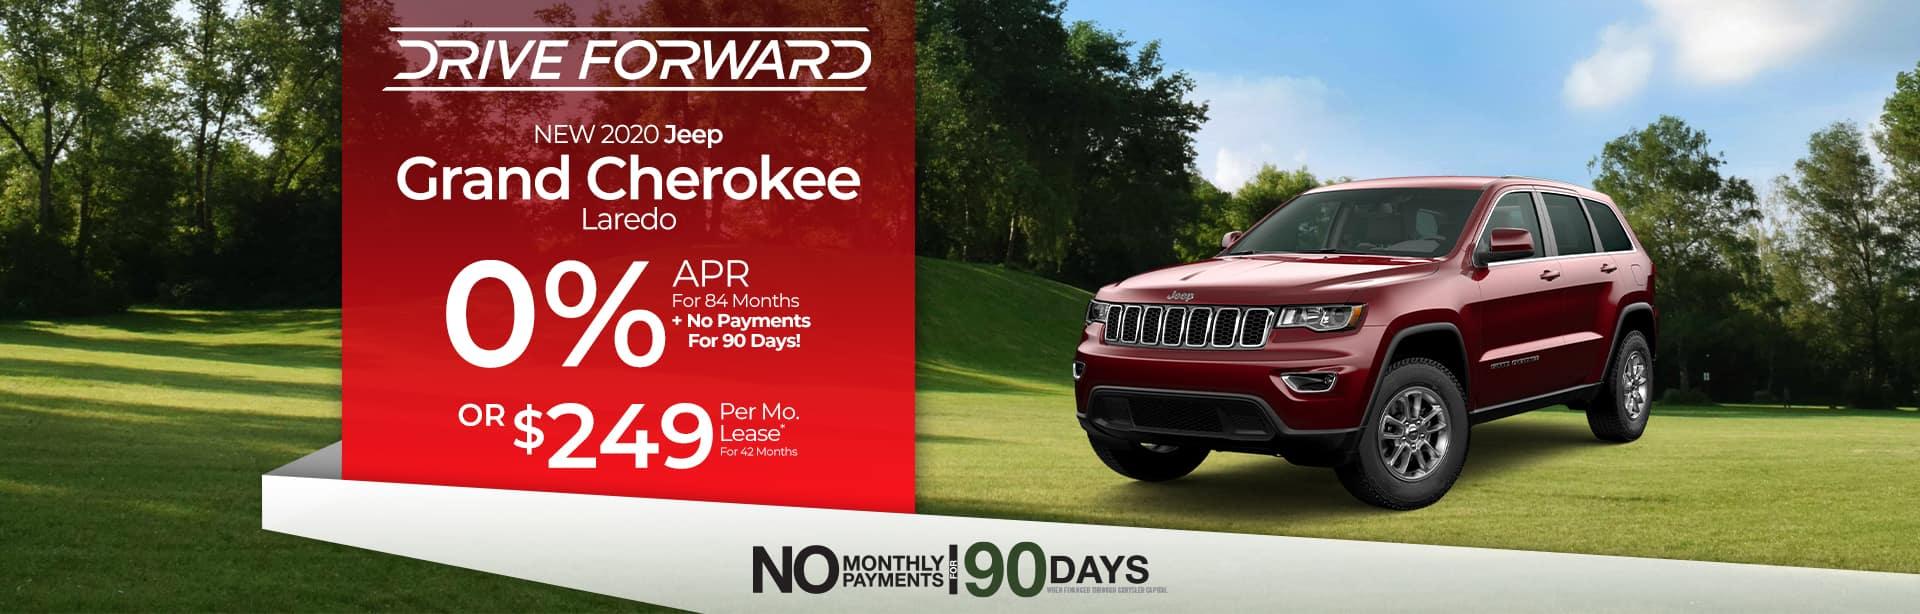 Best Deal on a New Jeep Grand Cherokee near Auburn, Indiana